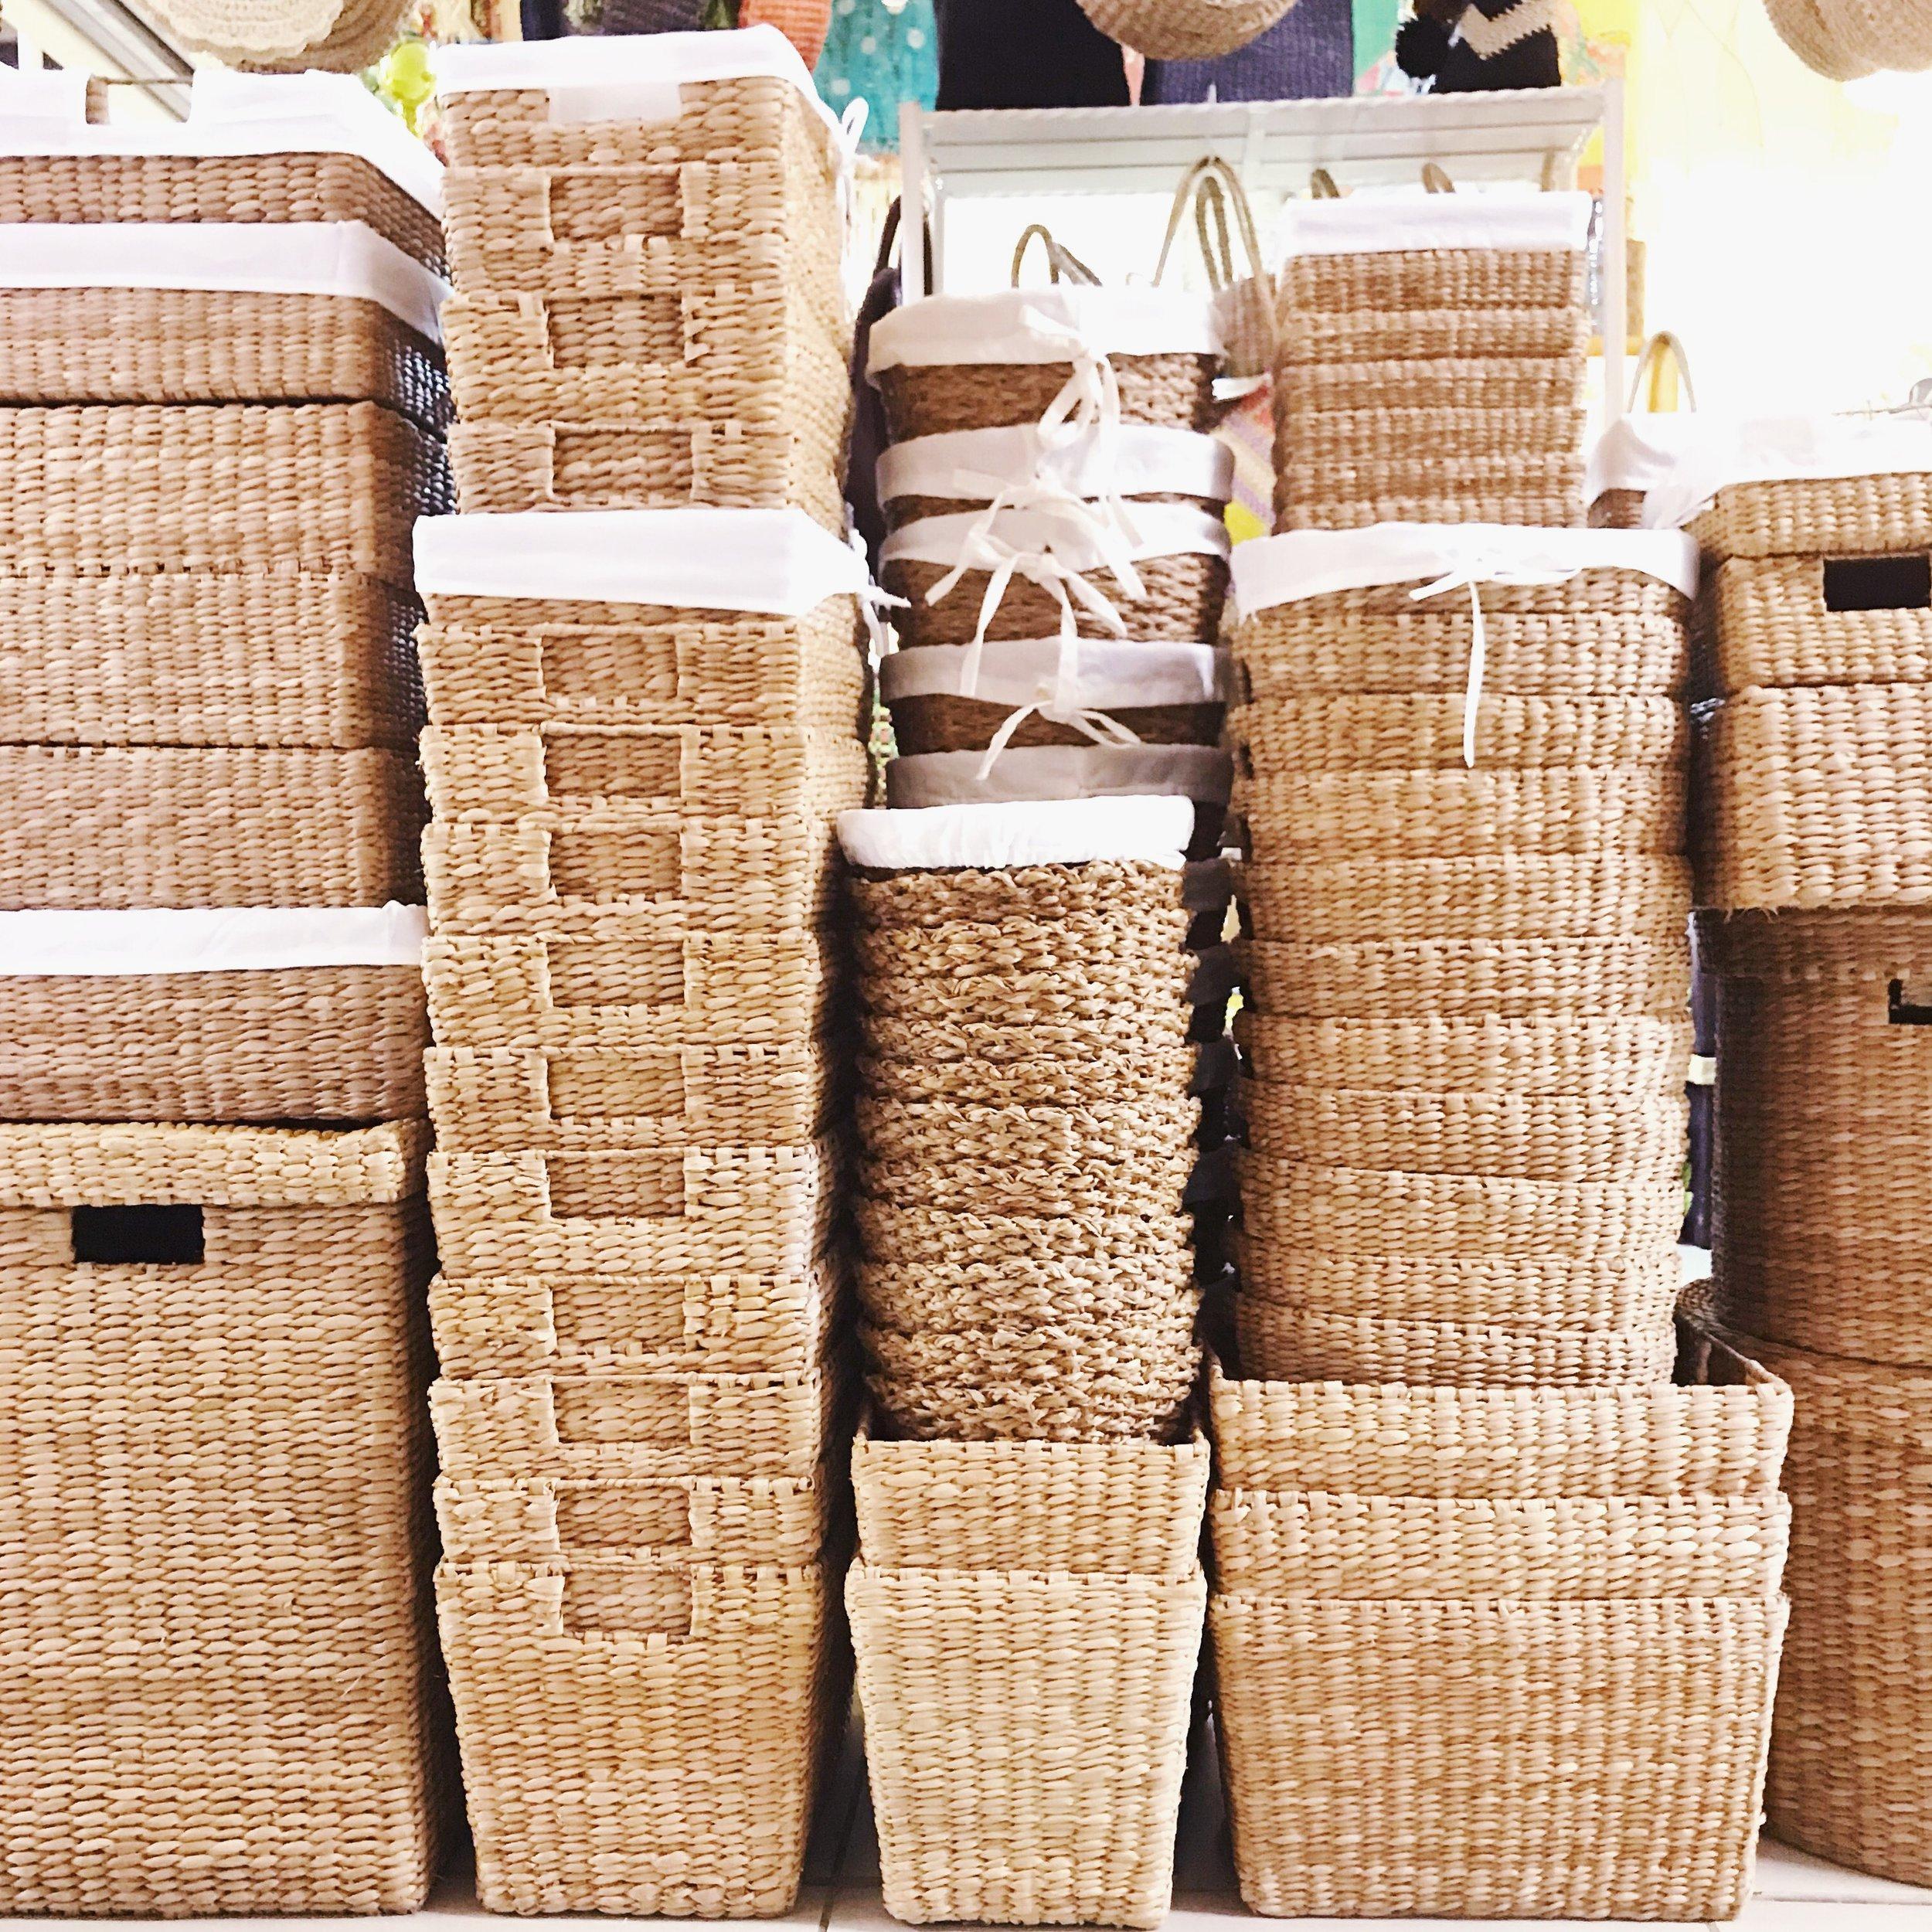 - Magayon handmadelocated at tiendesitasOrtigas Avenue cor.E. Rodriguez Ave. (C-5)Metro Manila, Philippinesor order online throughinstagram